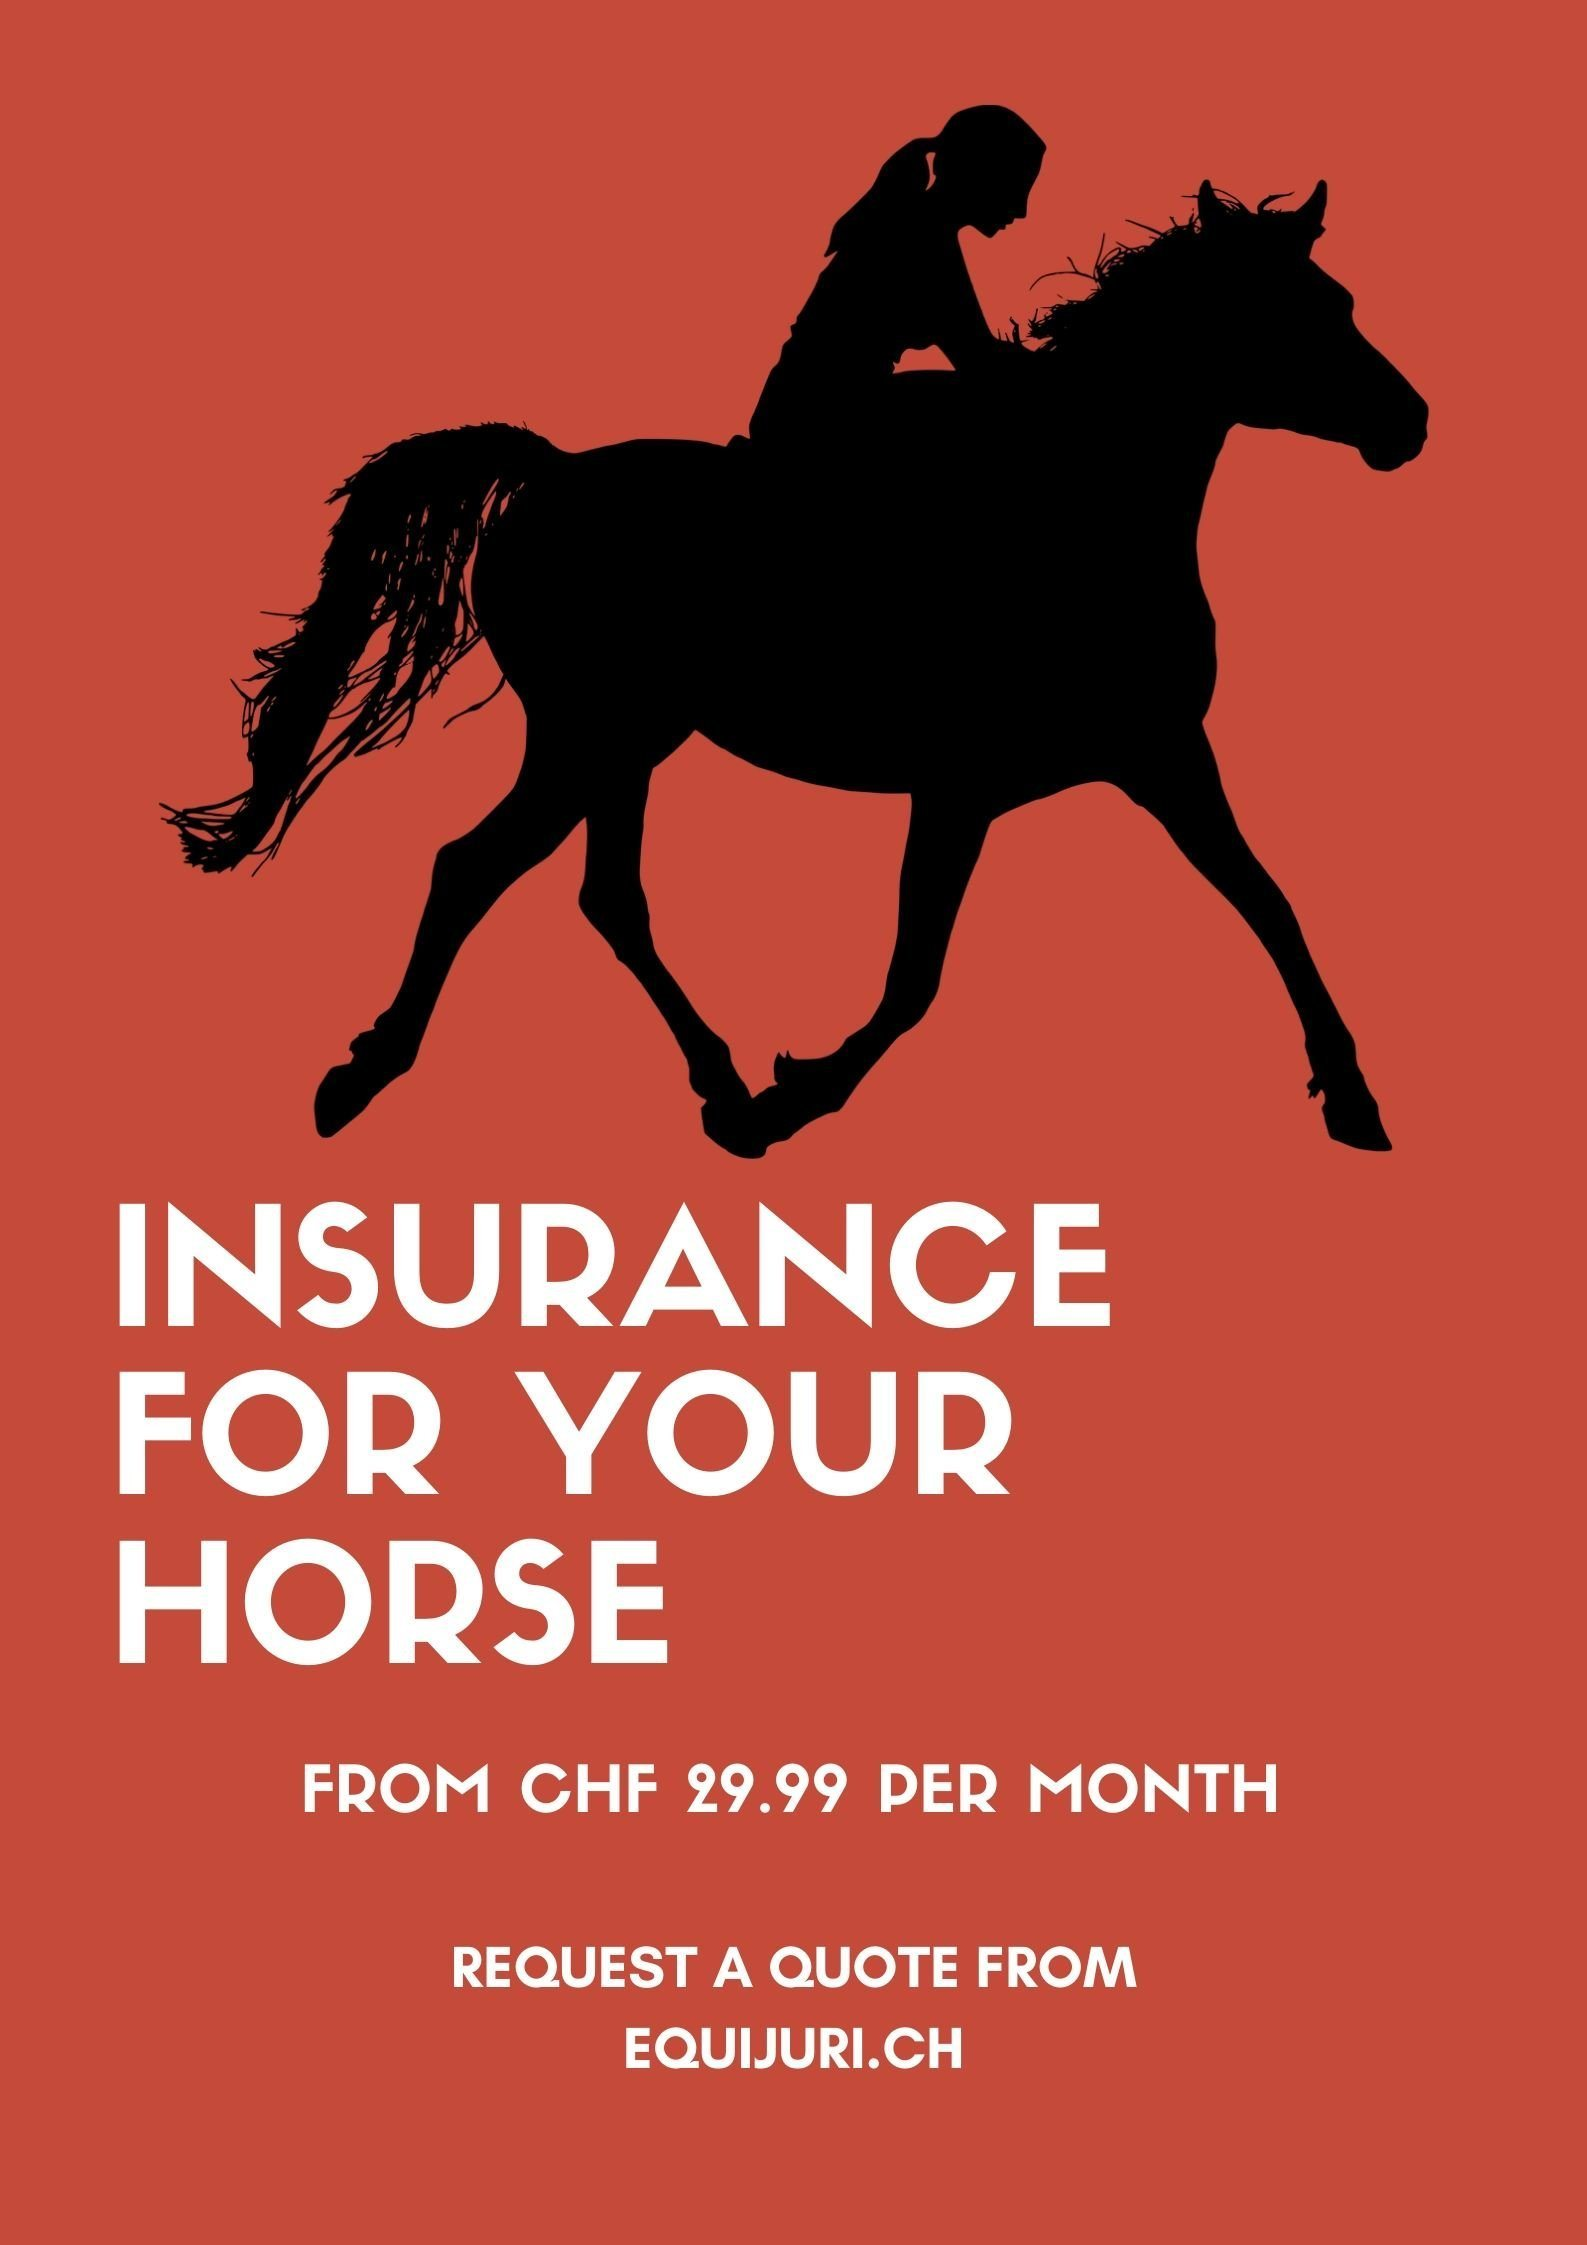 Horse Insurance EquiJuri